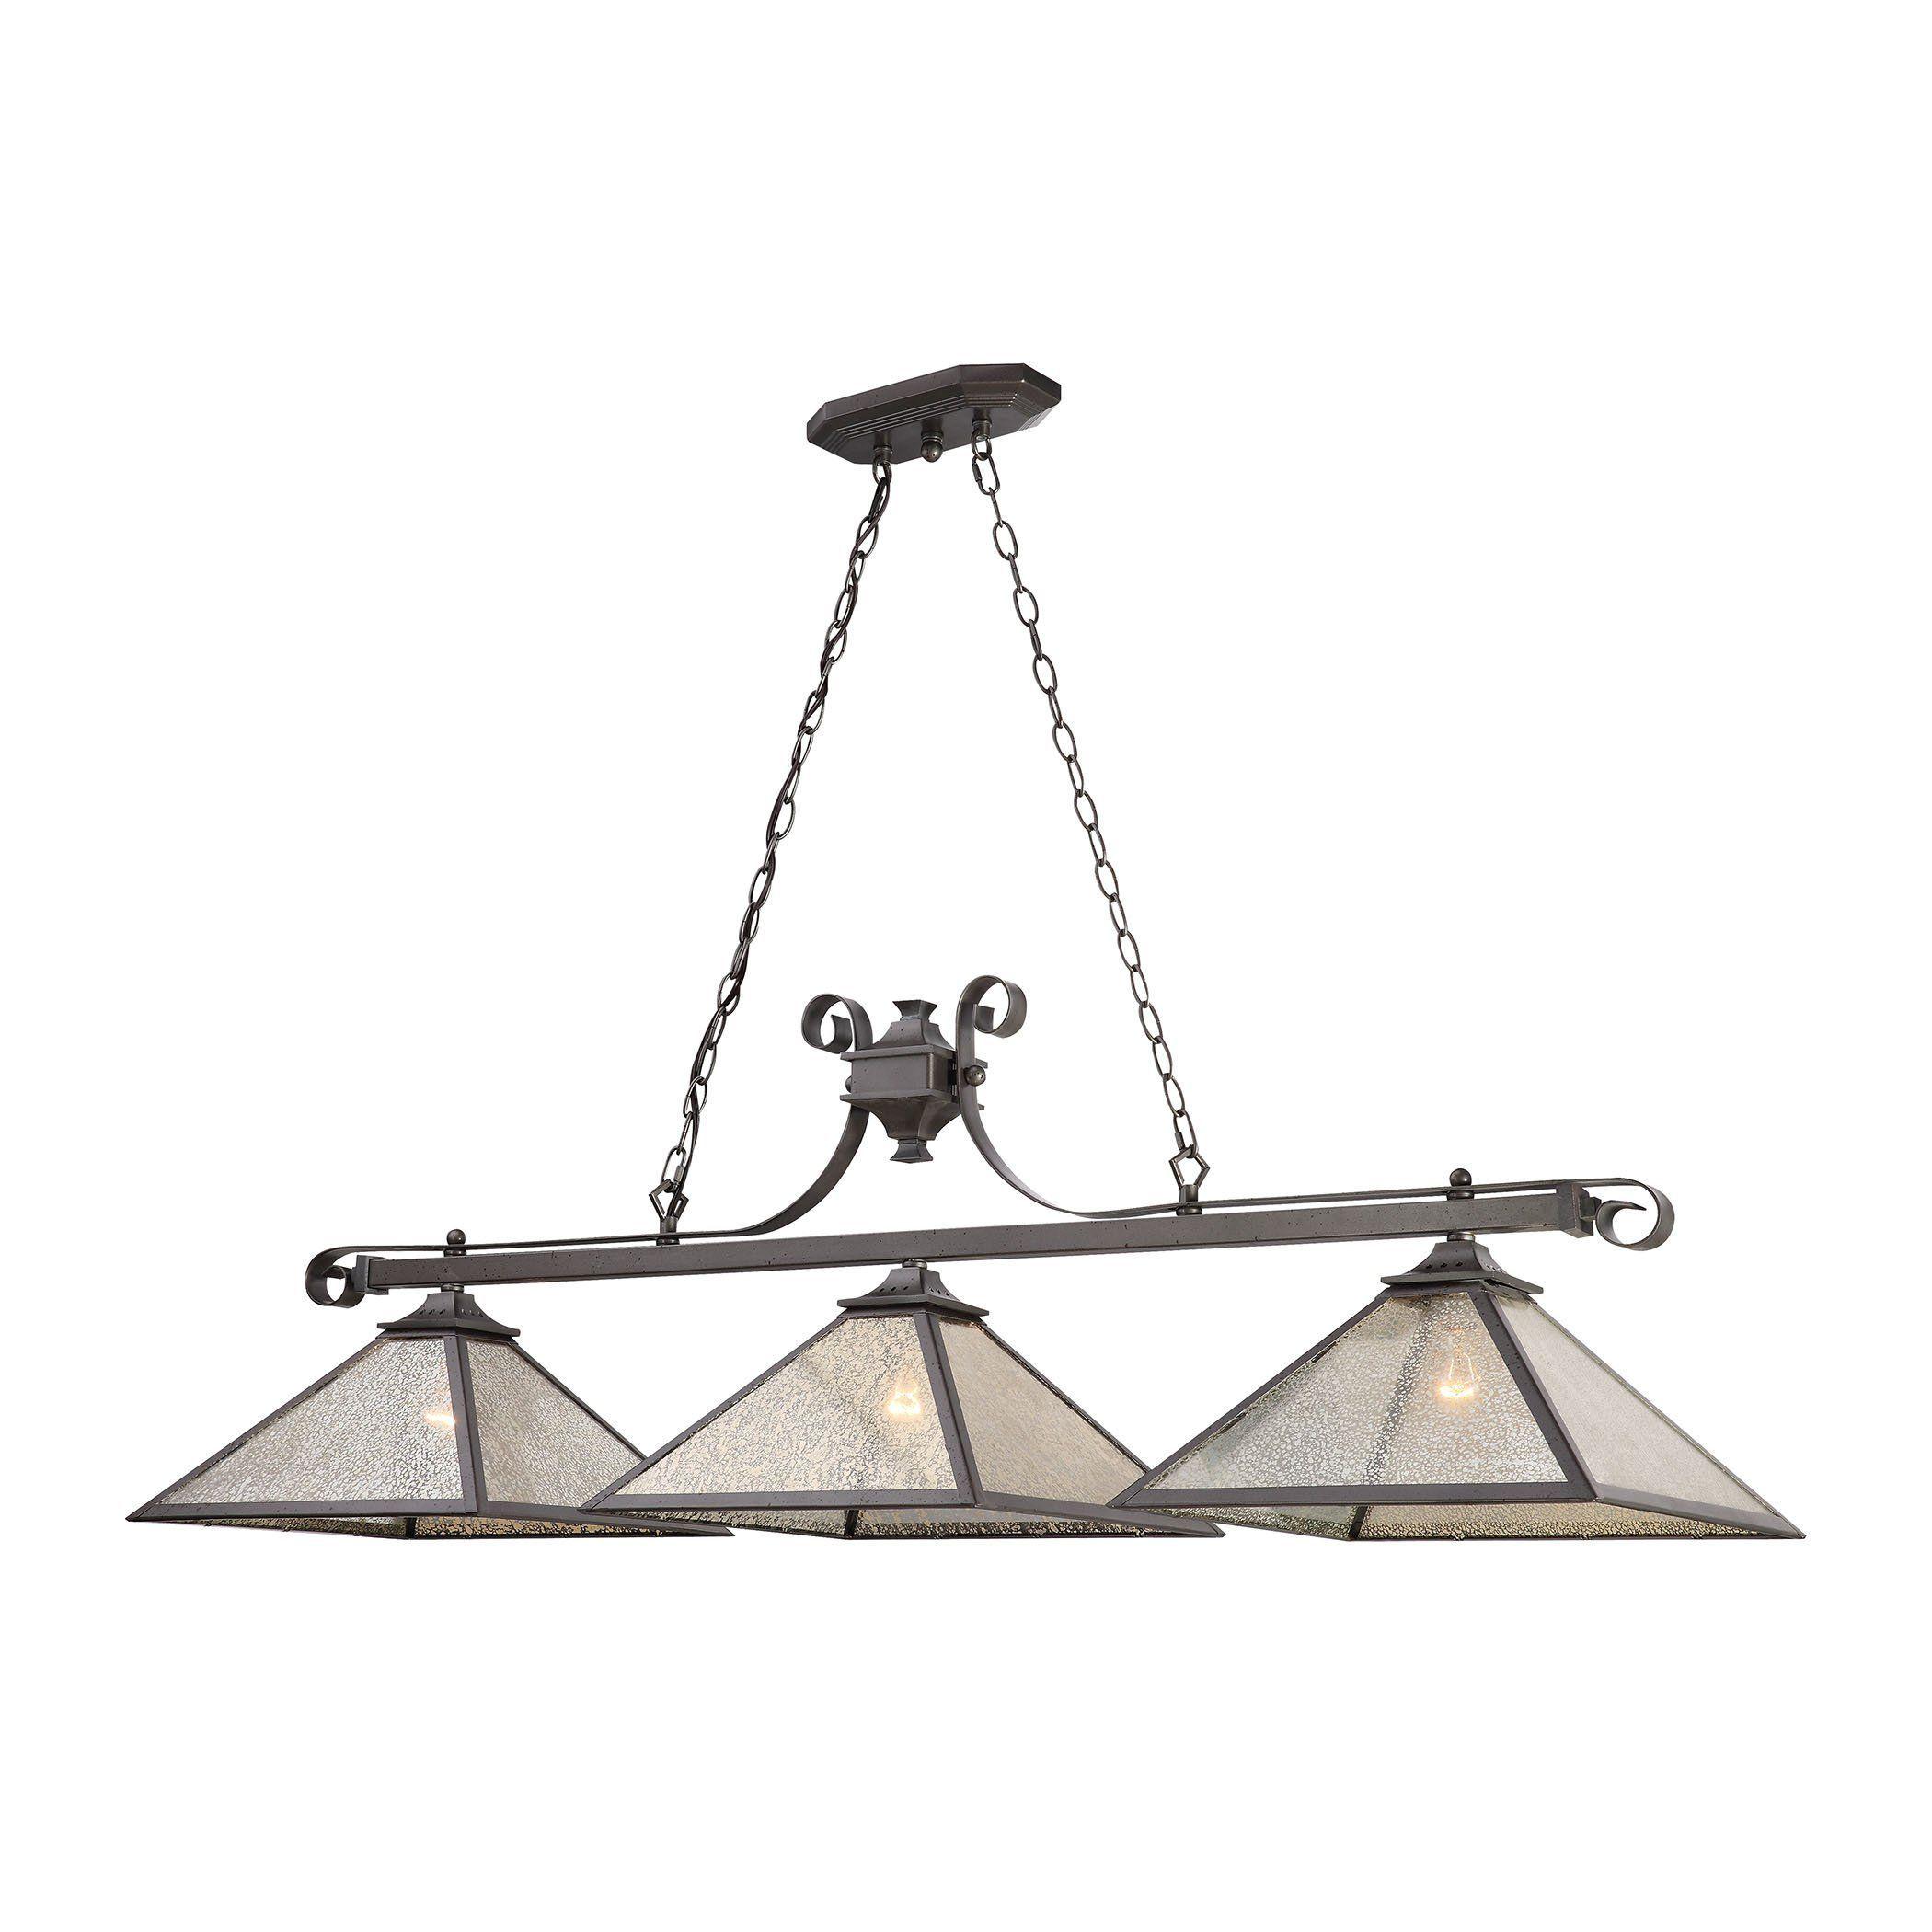 Plano 3 Light Billiard In Iron Rust With Mercury Glass 70276/3